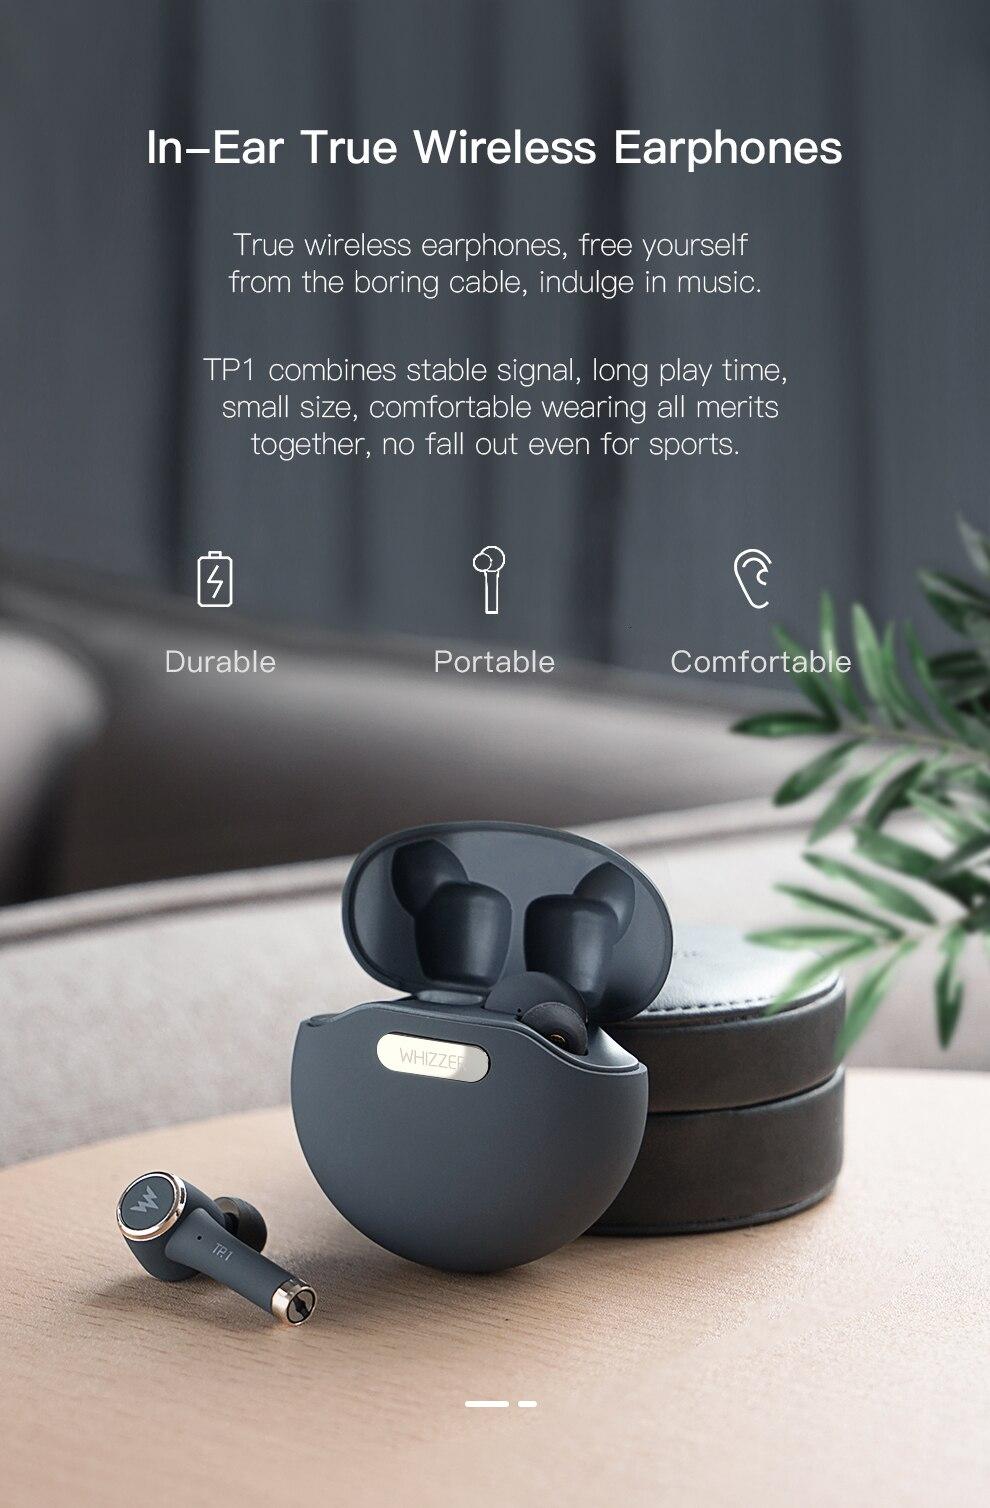 WHIZZER TP1S TWS Wireless Bluetooth Earphone 5